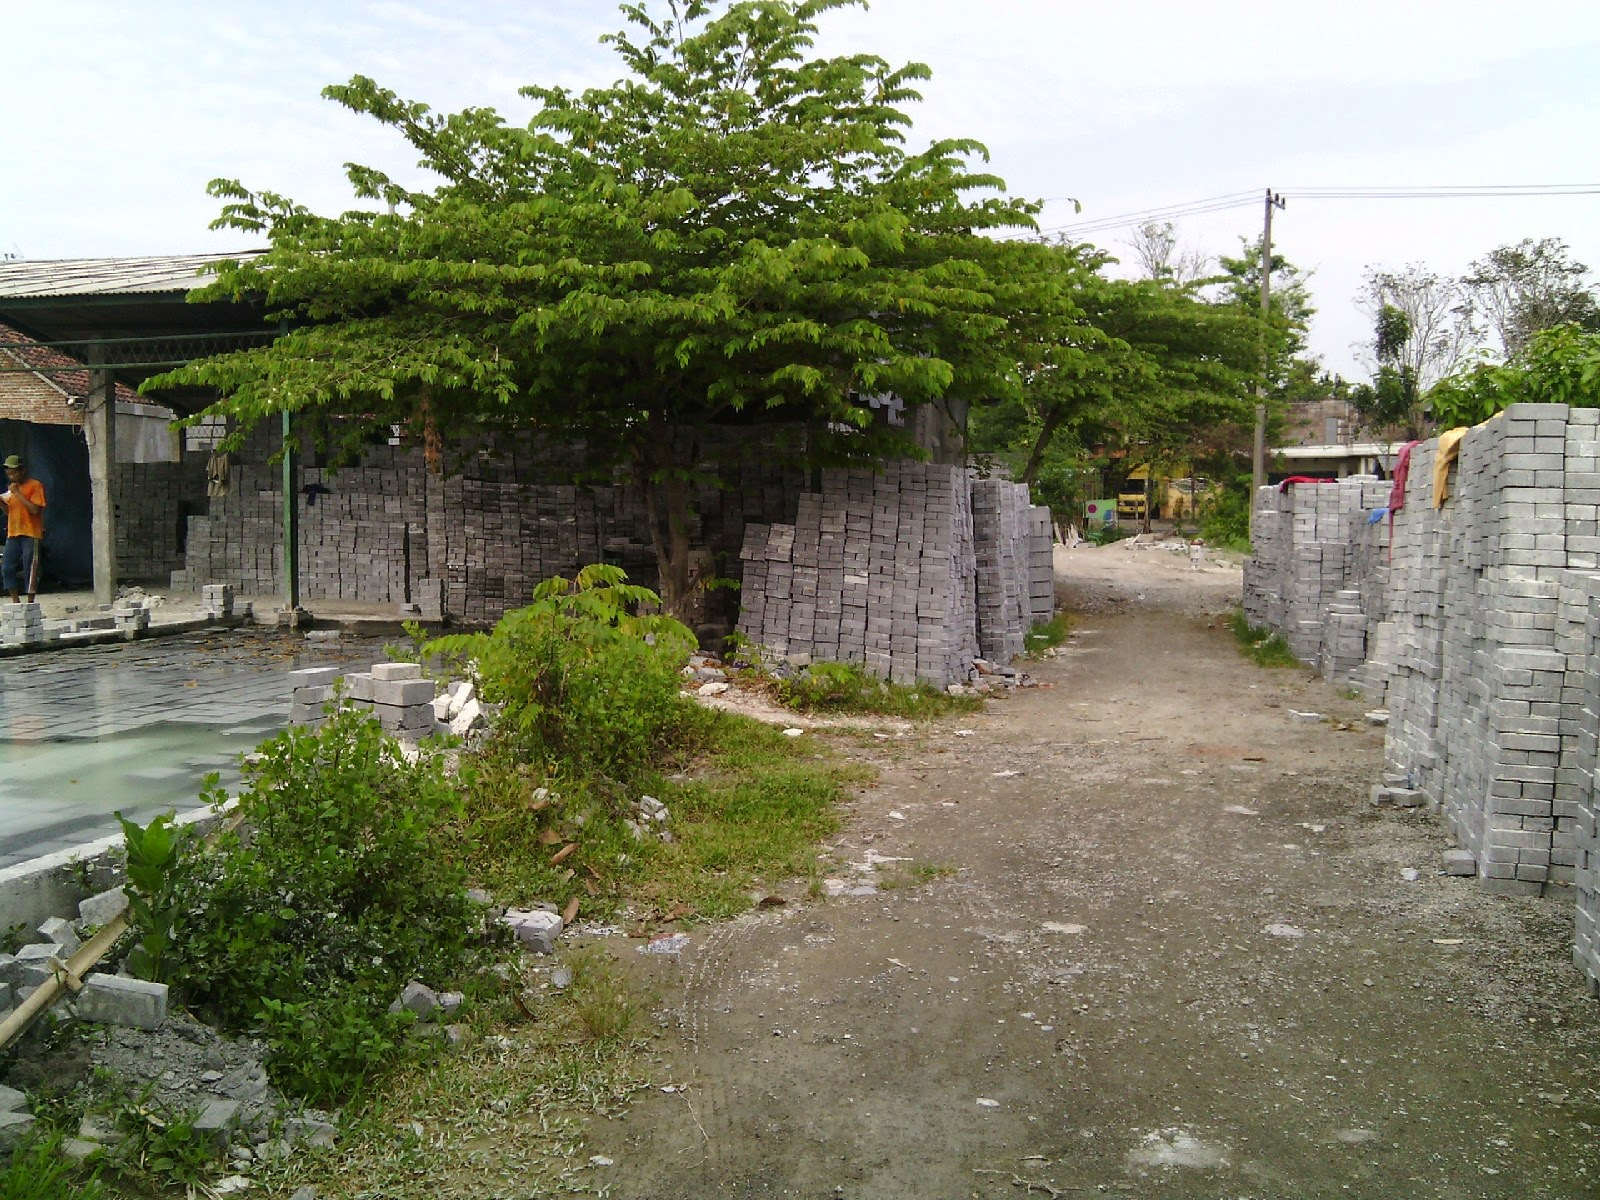 Jual Paving Block Di Madiun